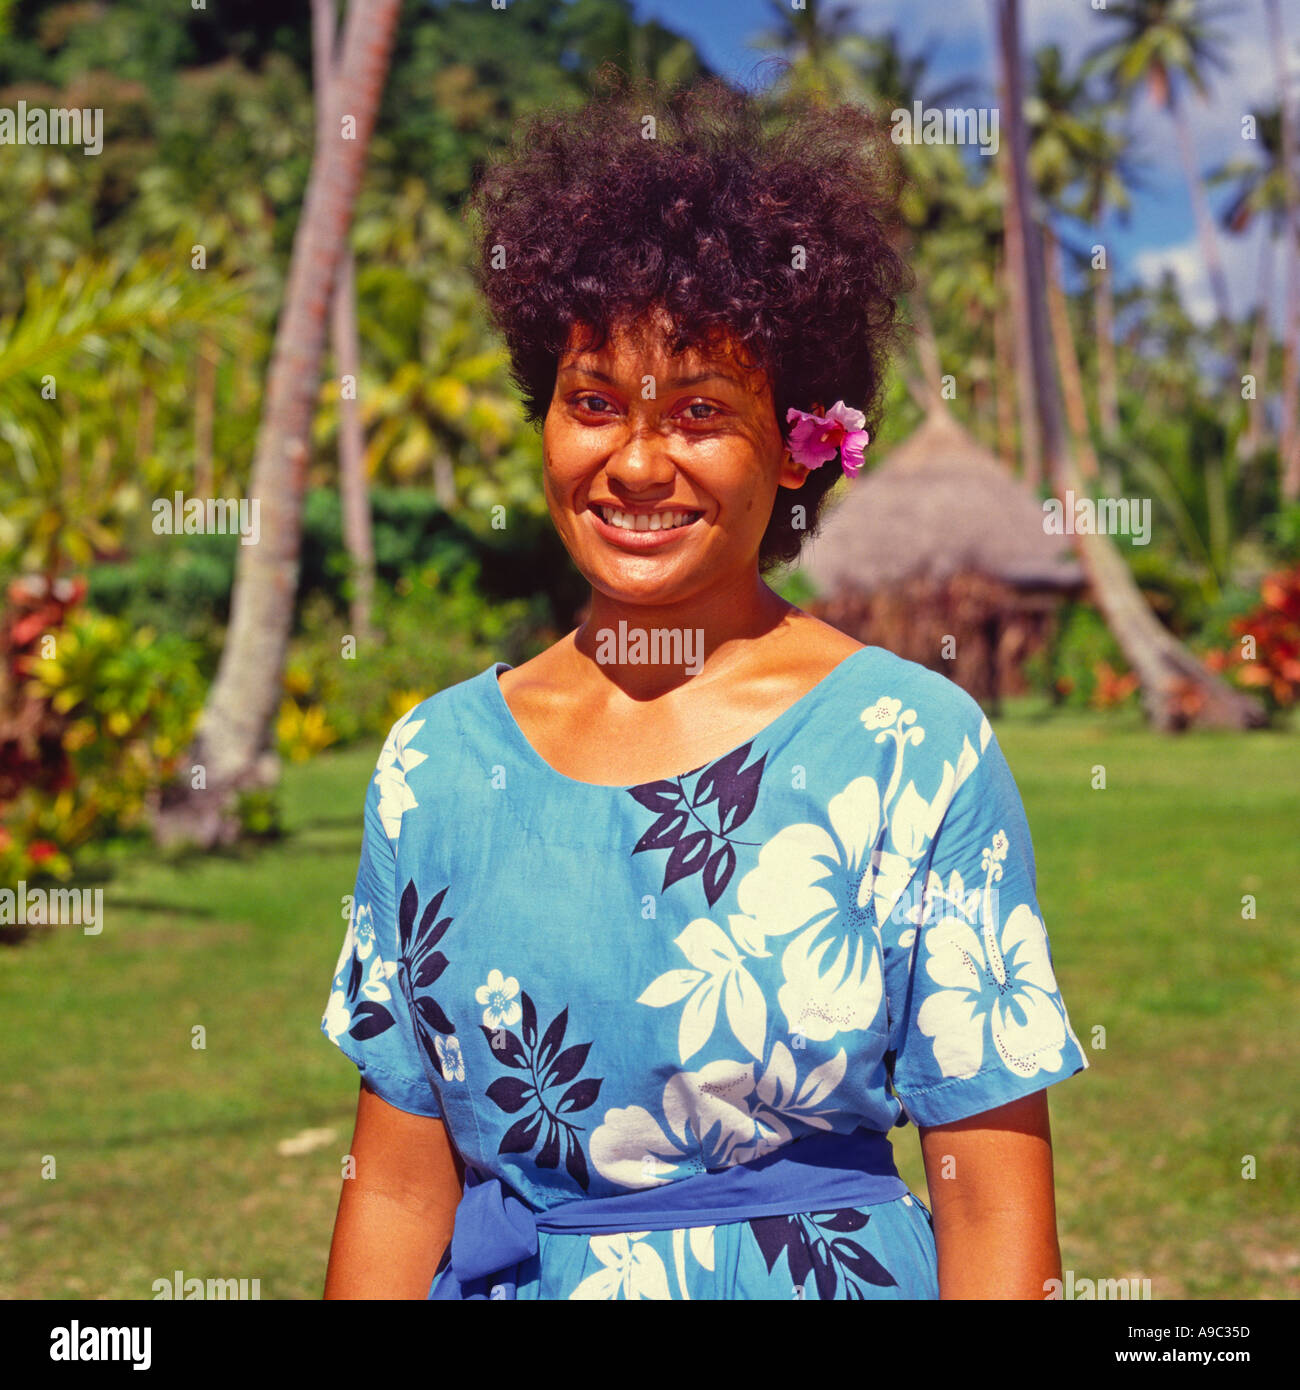 Fiji girls images